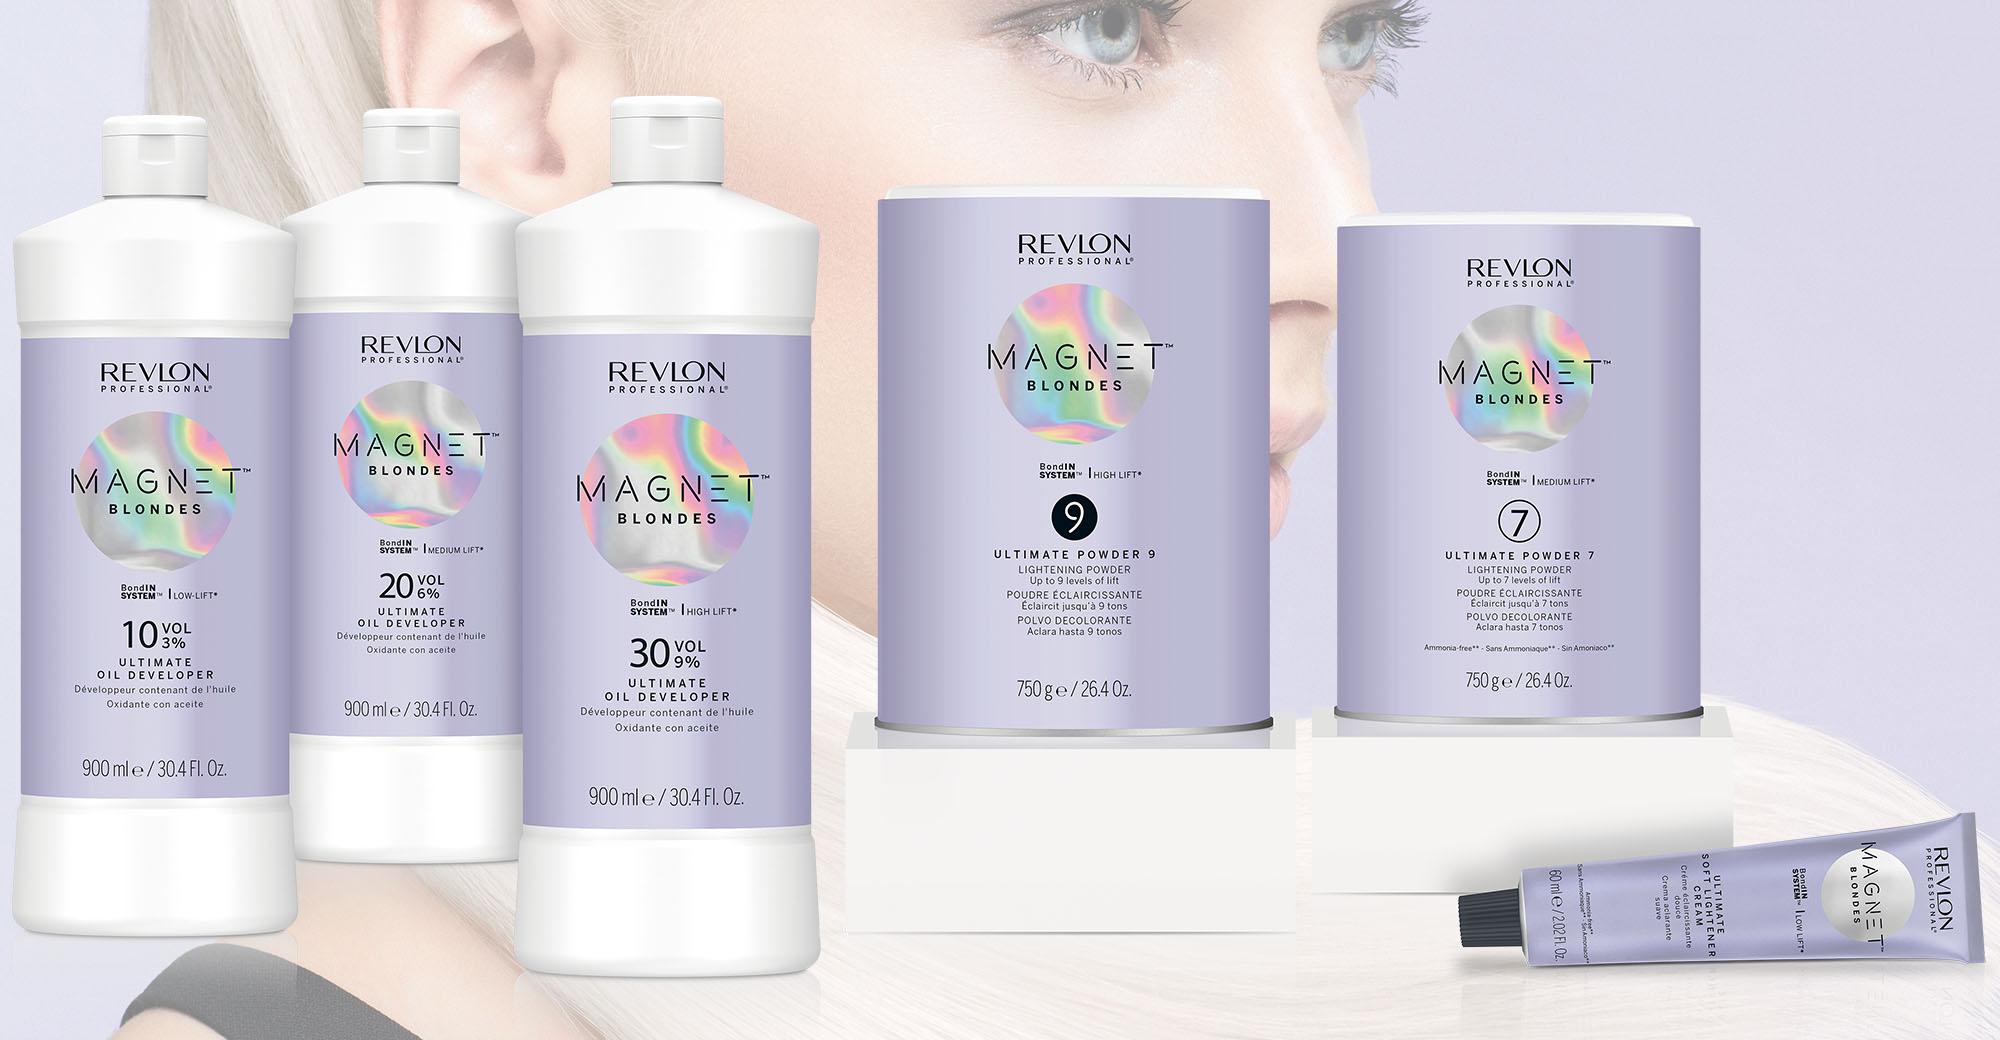 RPB Magnet Blondes-tpl